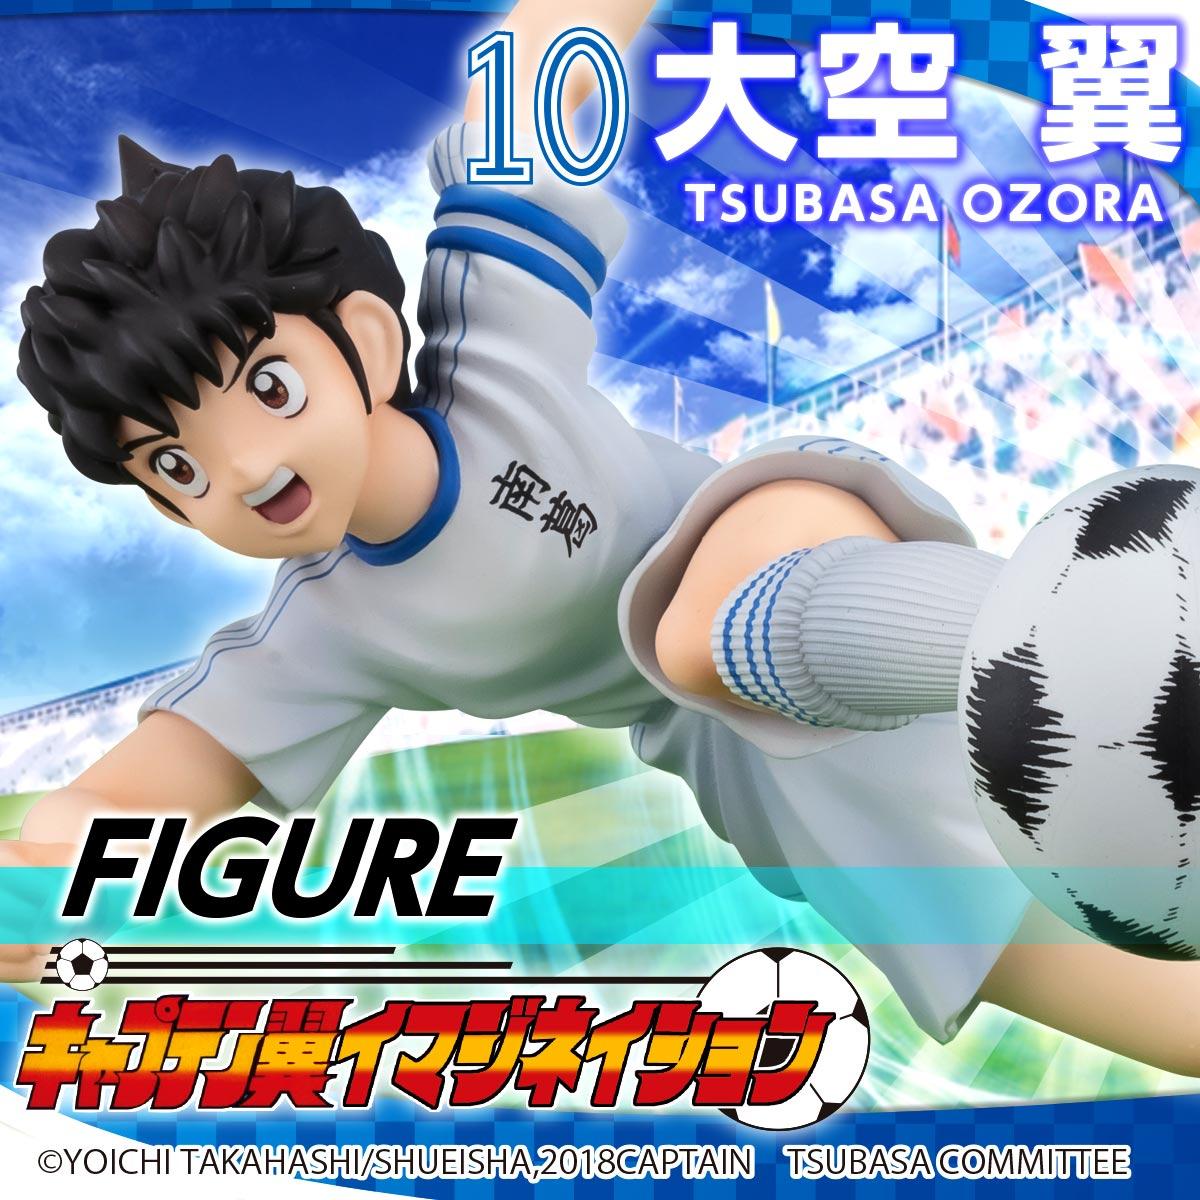 Captain Tsubasa Imagination Figure - Tsubasa Ozora